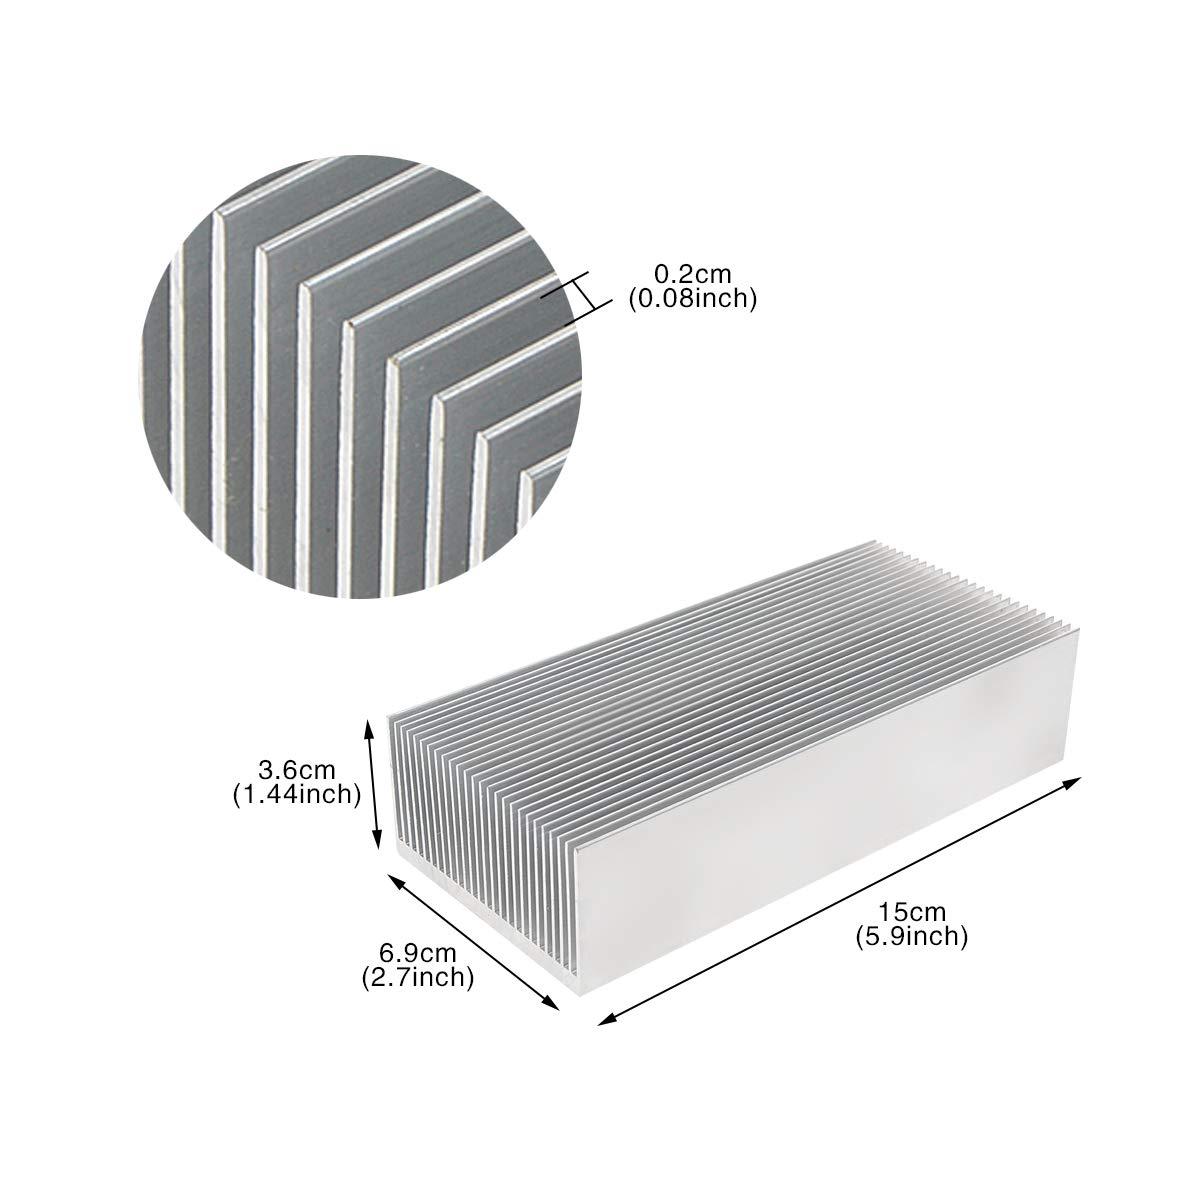 Pack of 2 Heat Sinks maxiFLOW Heatsink with maxiGRIP Attachment Blue-Anodized ATS-50250G-C1-R0 25x25x12.5mm, T766